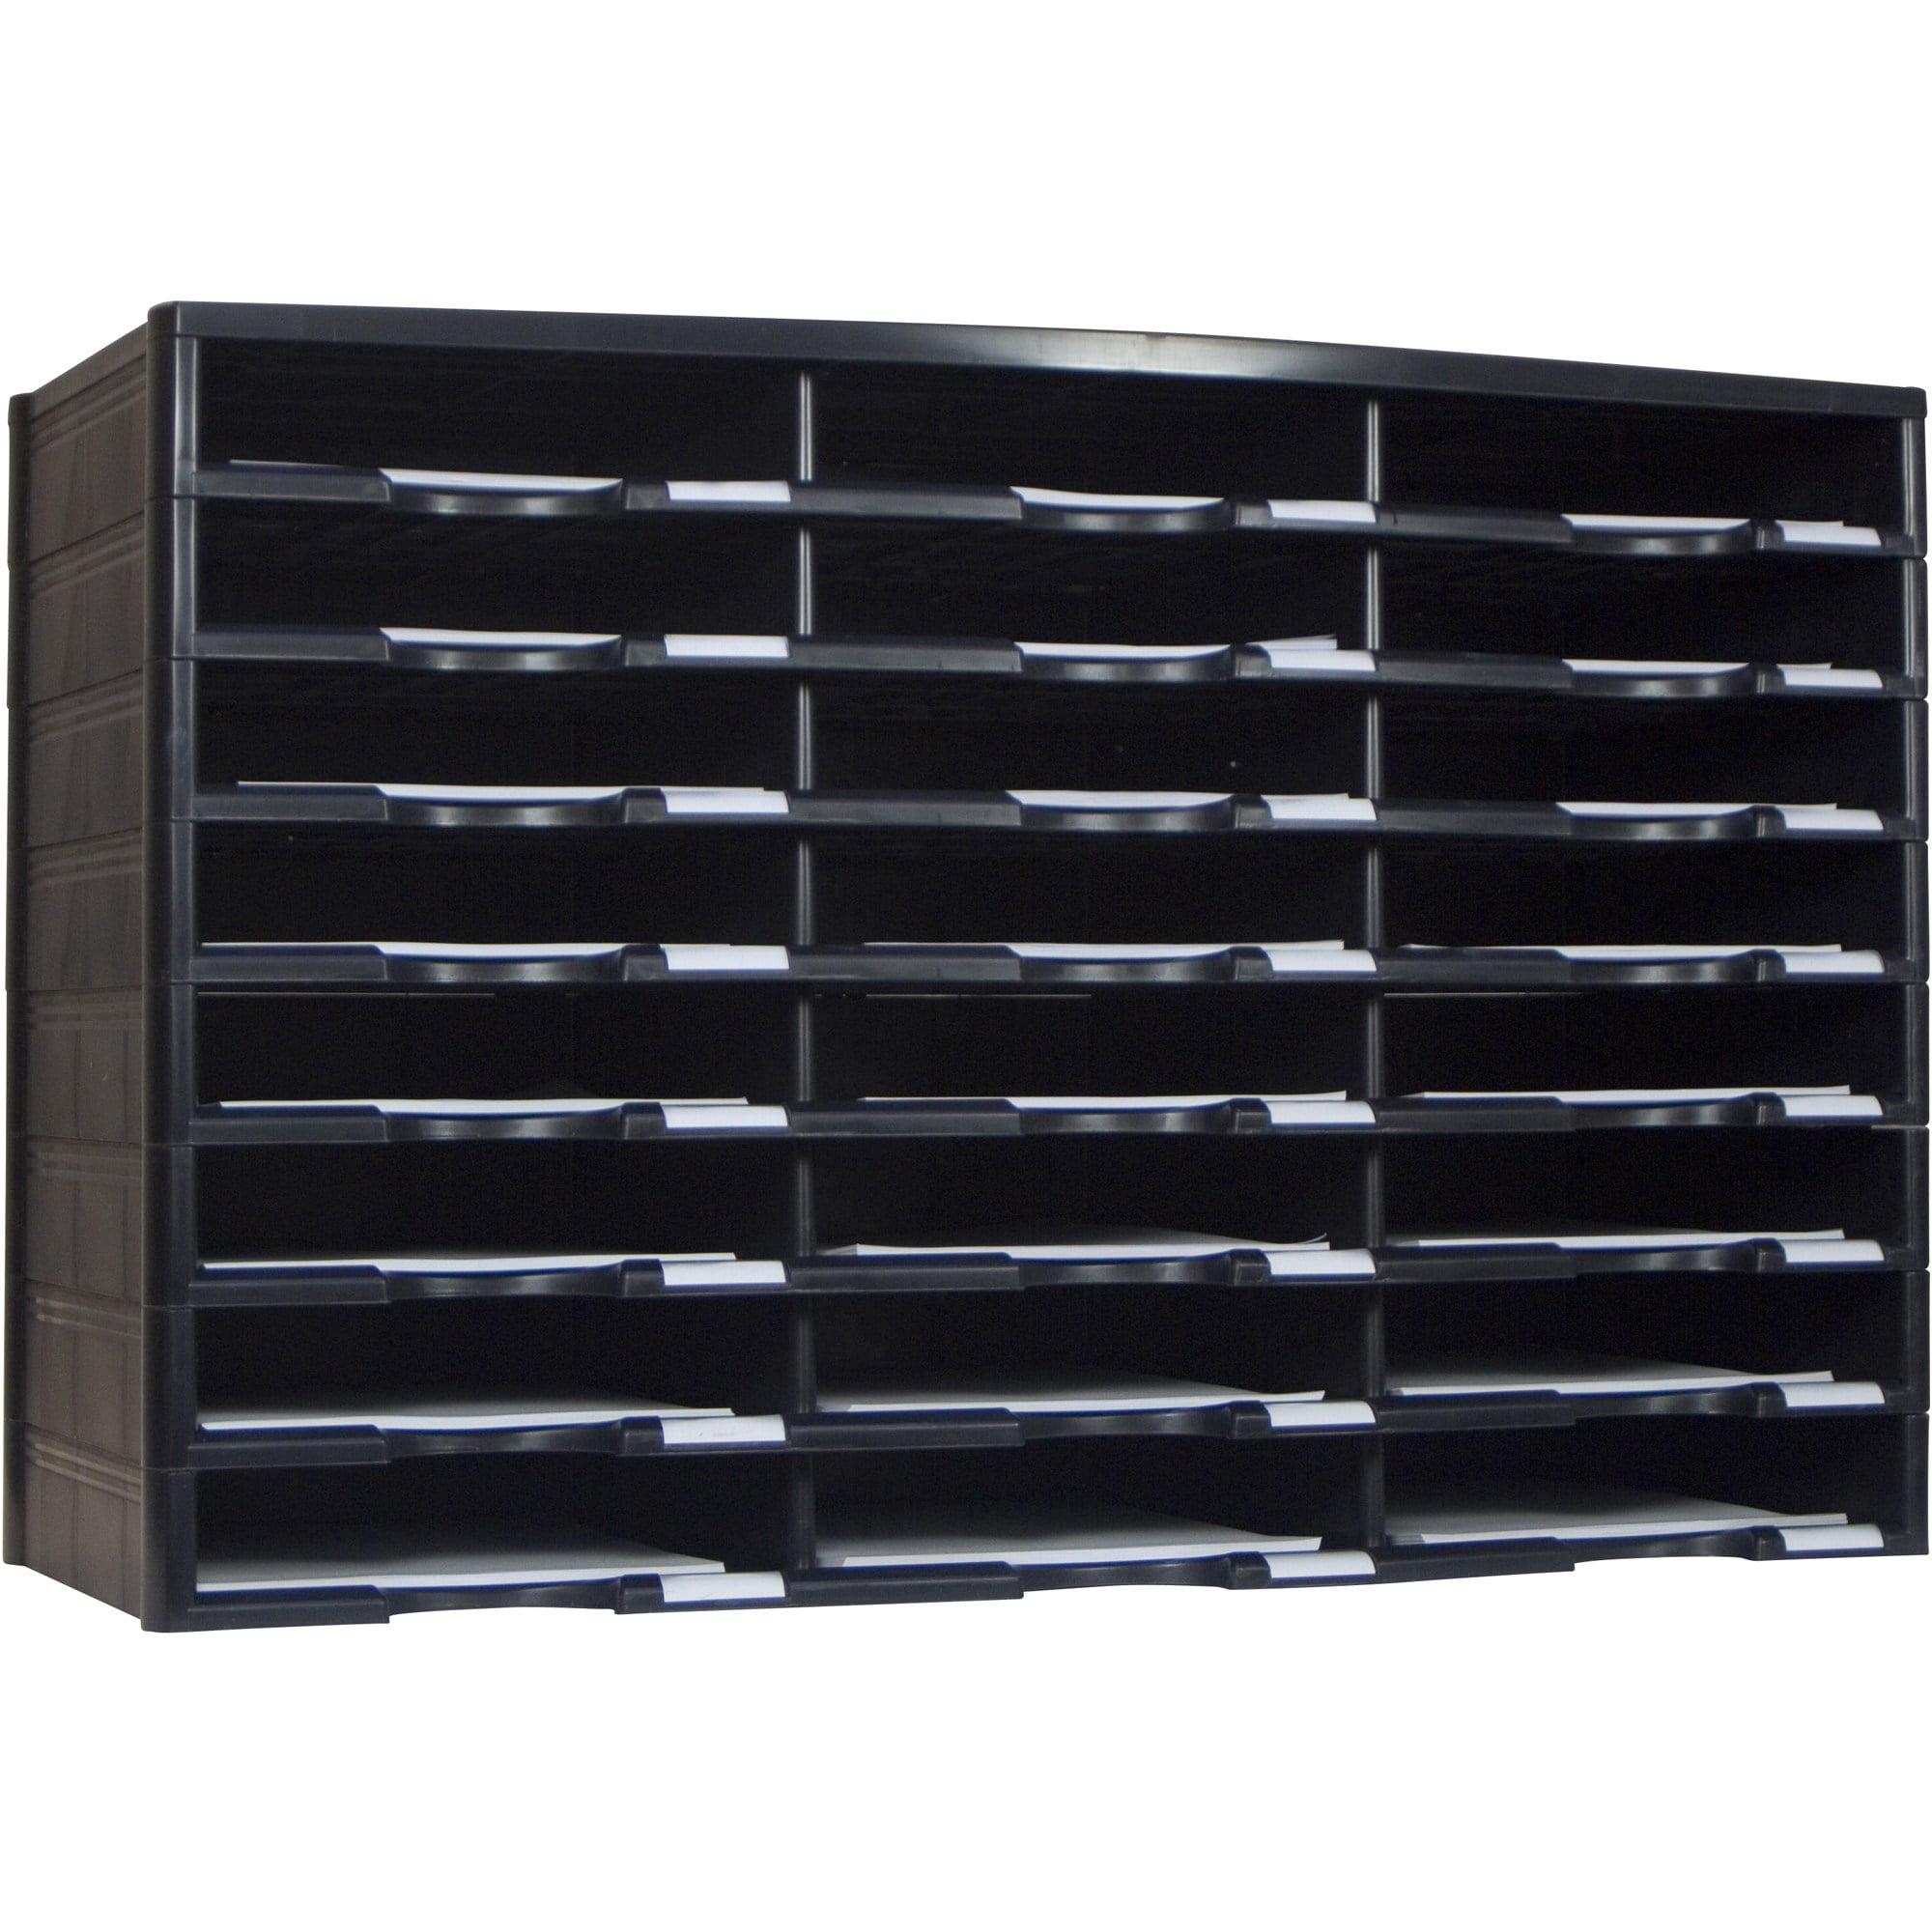 Storex Black 24-Compartment Literature Organizer by Overstock